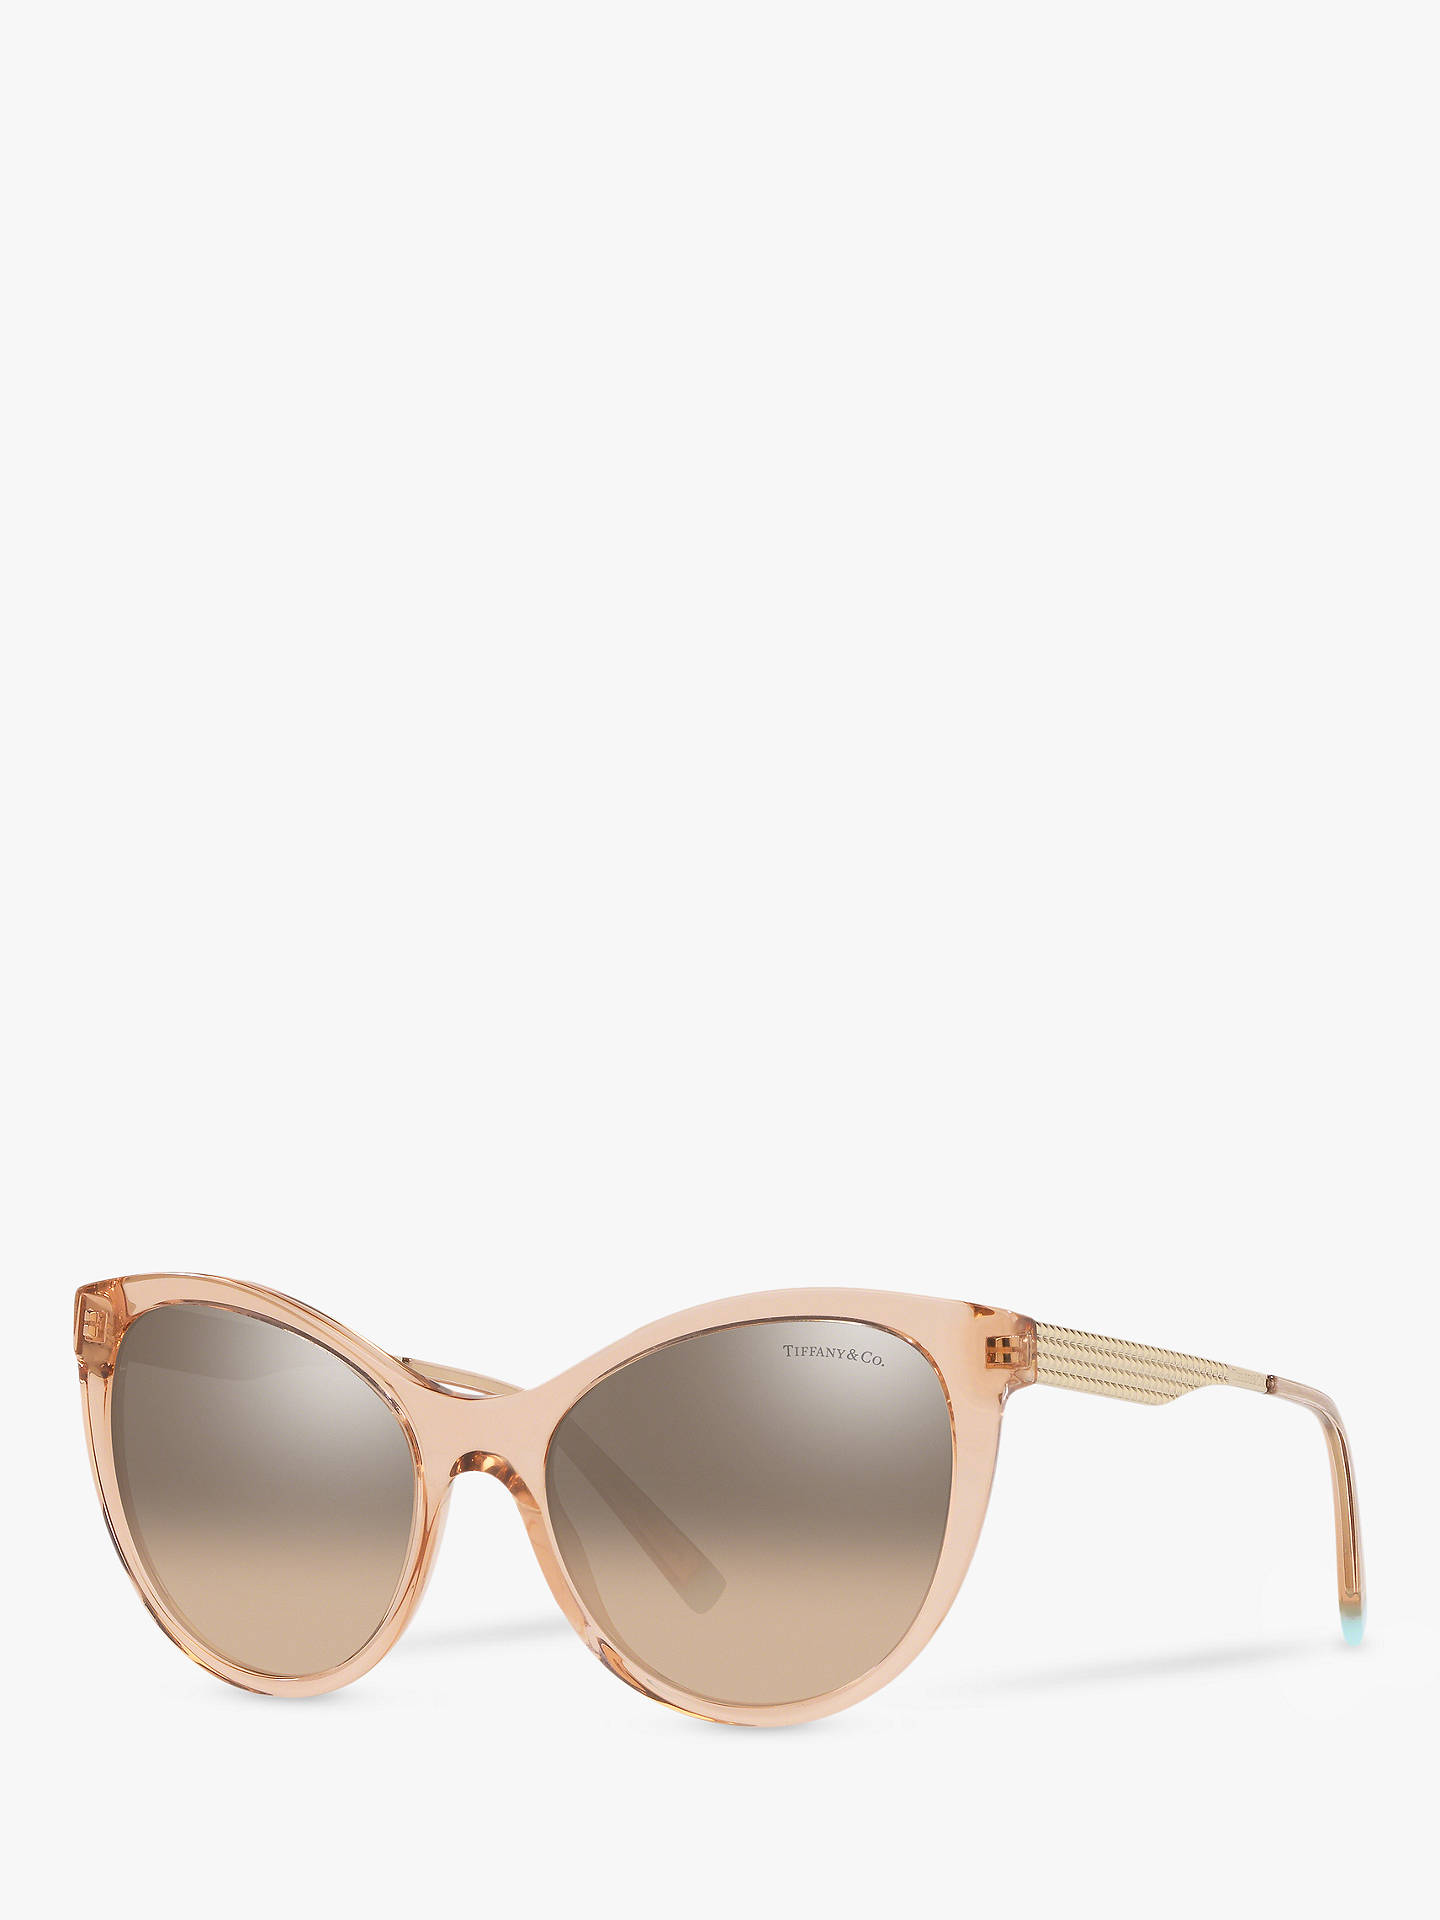 62ef0dc939a Tiffany   Co TF4159 Women s Cat s Eye Sunglasses at John Lewis ...